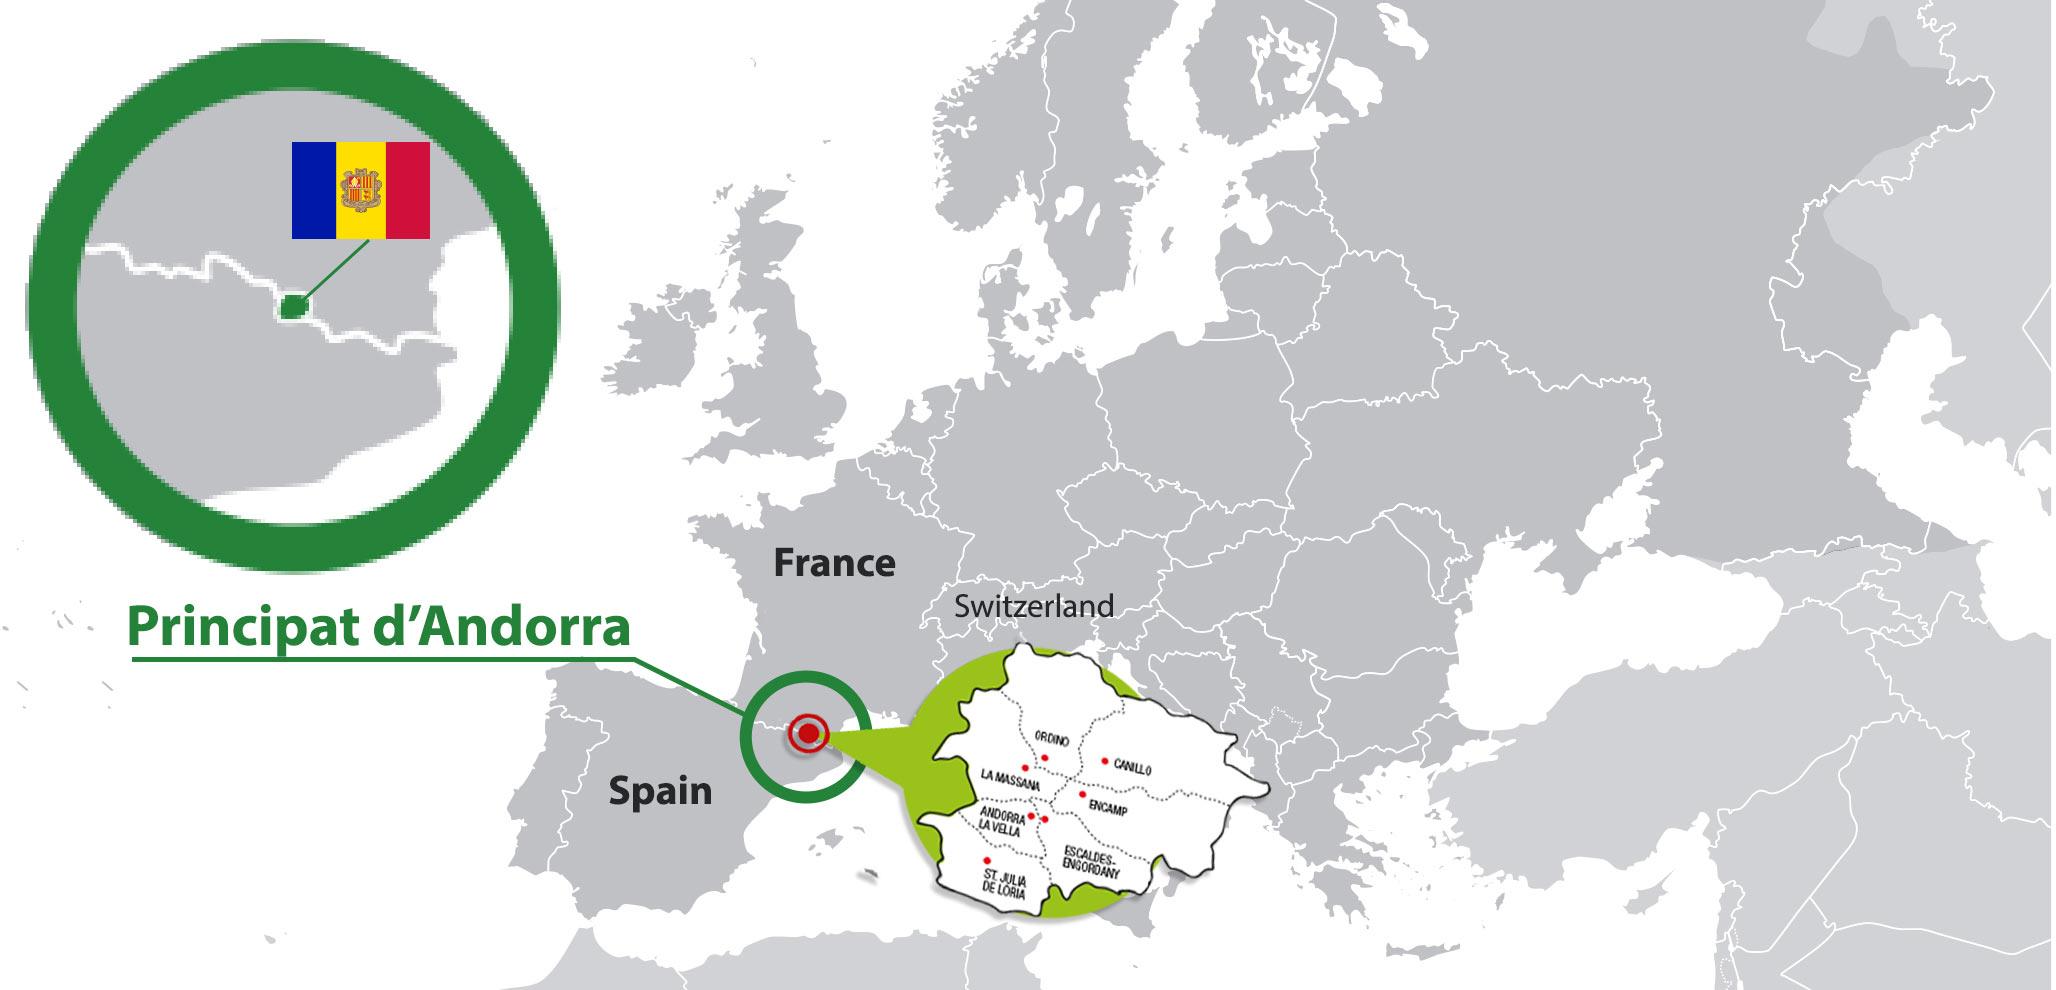 Our storymap Freemindtronic Principat d'Andorra Europe